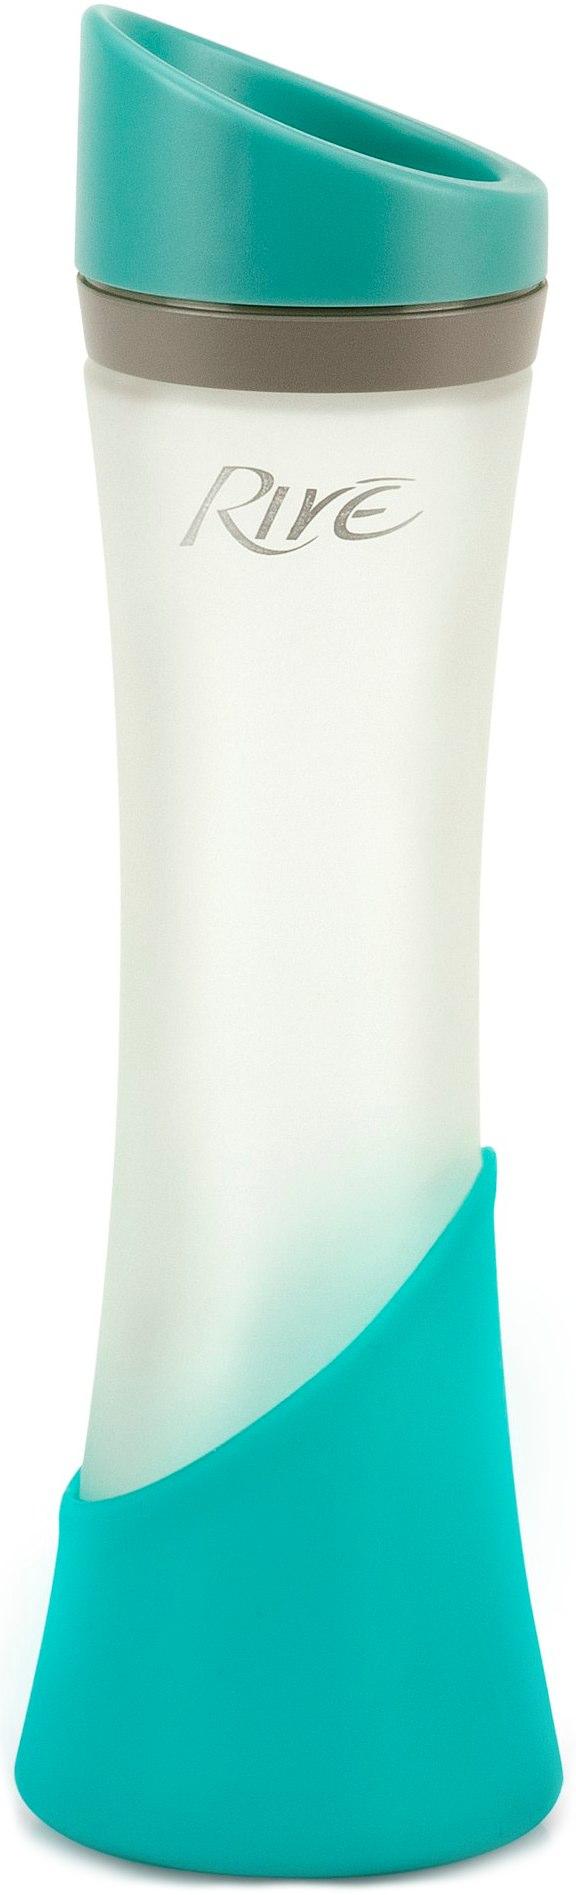 Rive Elan Aqua Glass Water Bottle, 12 Ounce